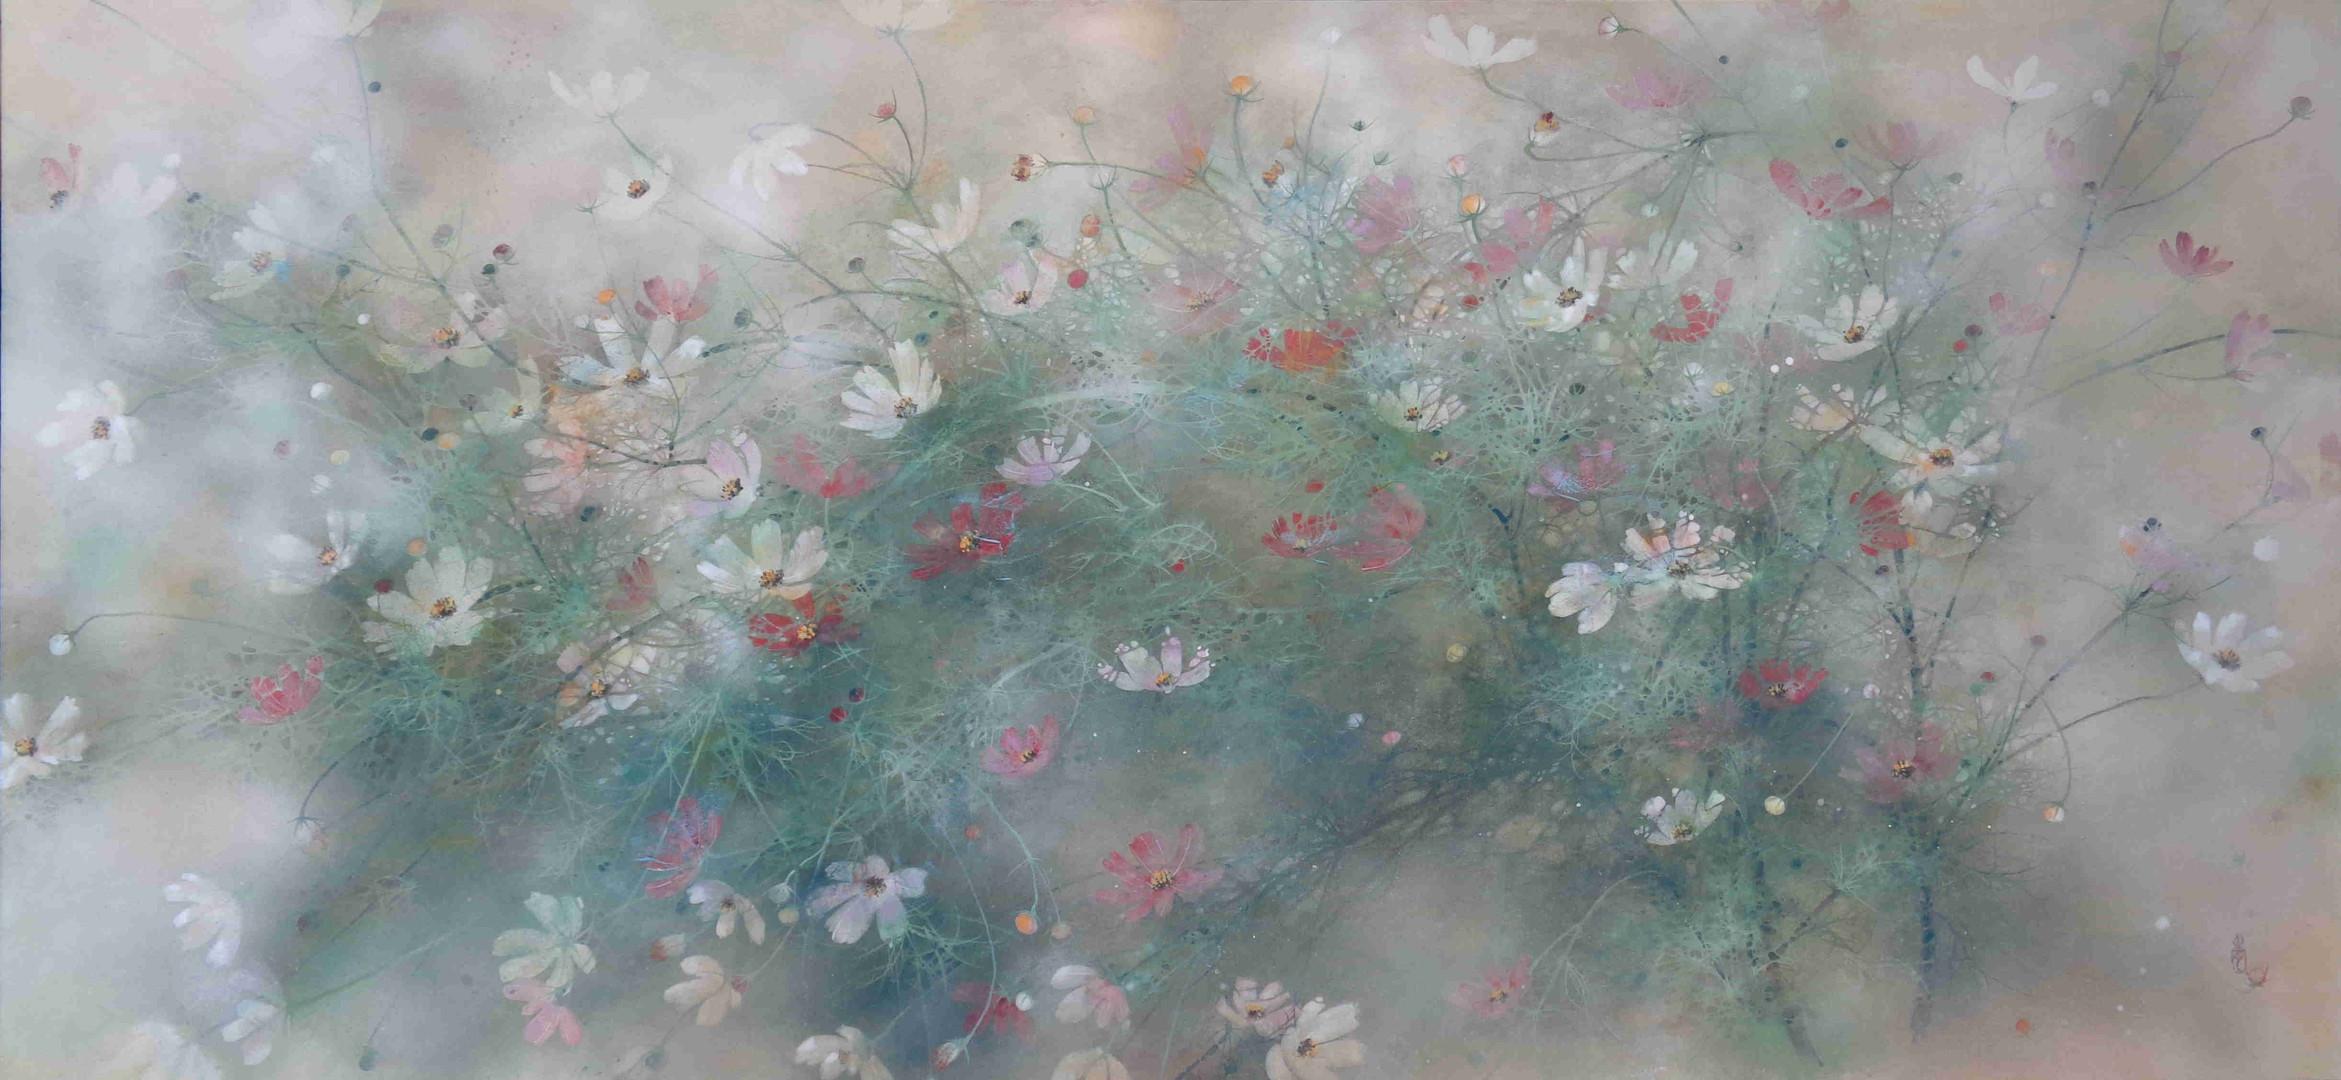 Blossoming Impressionism - 70 x 150 cm / 2021